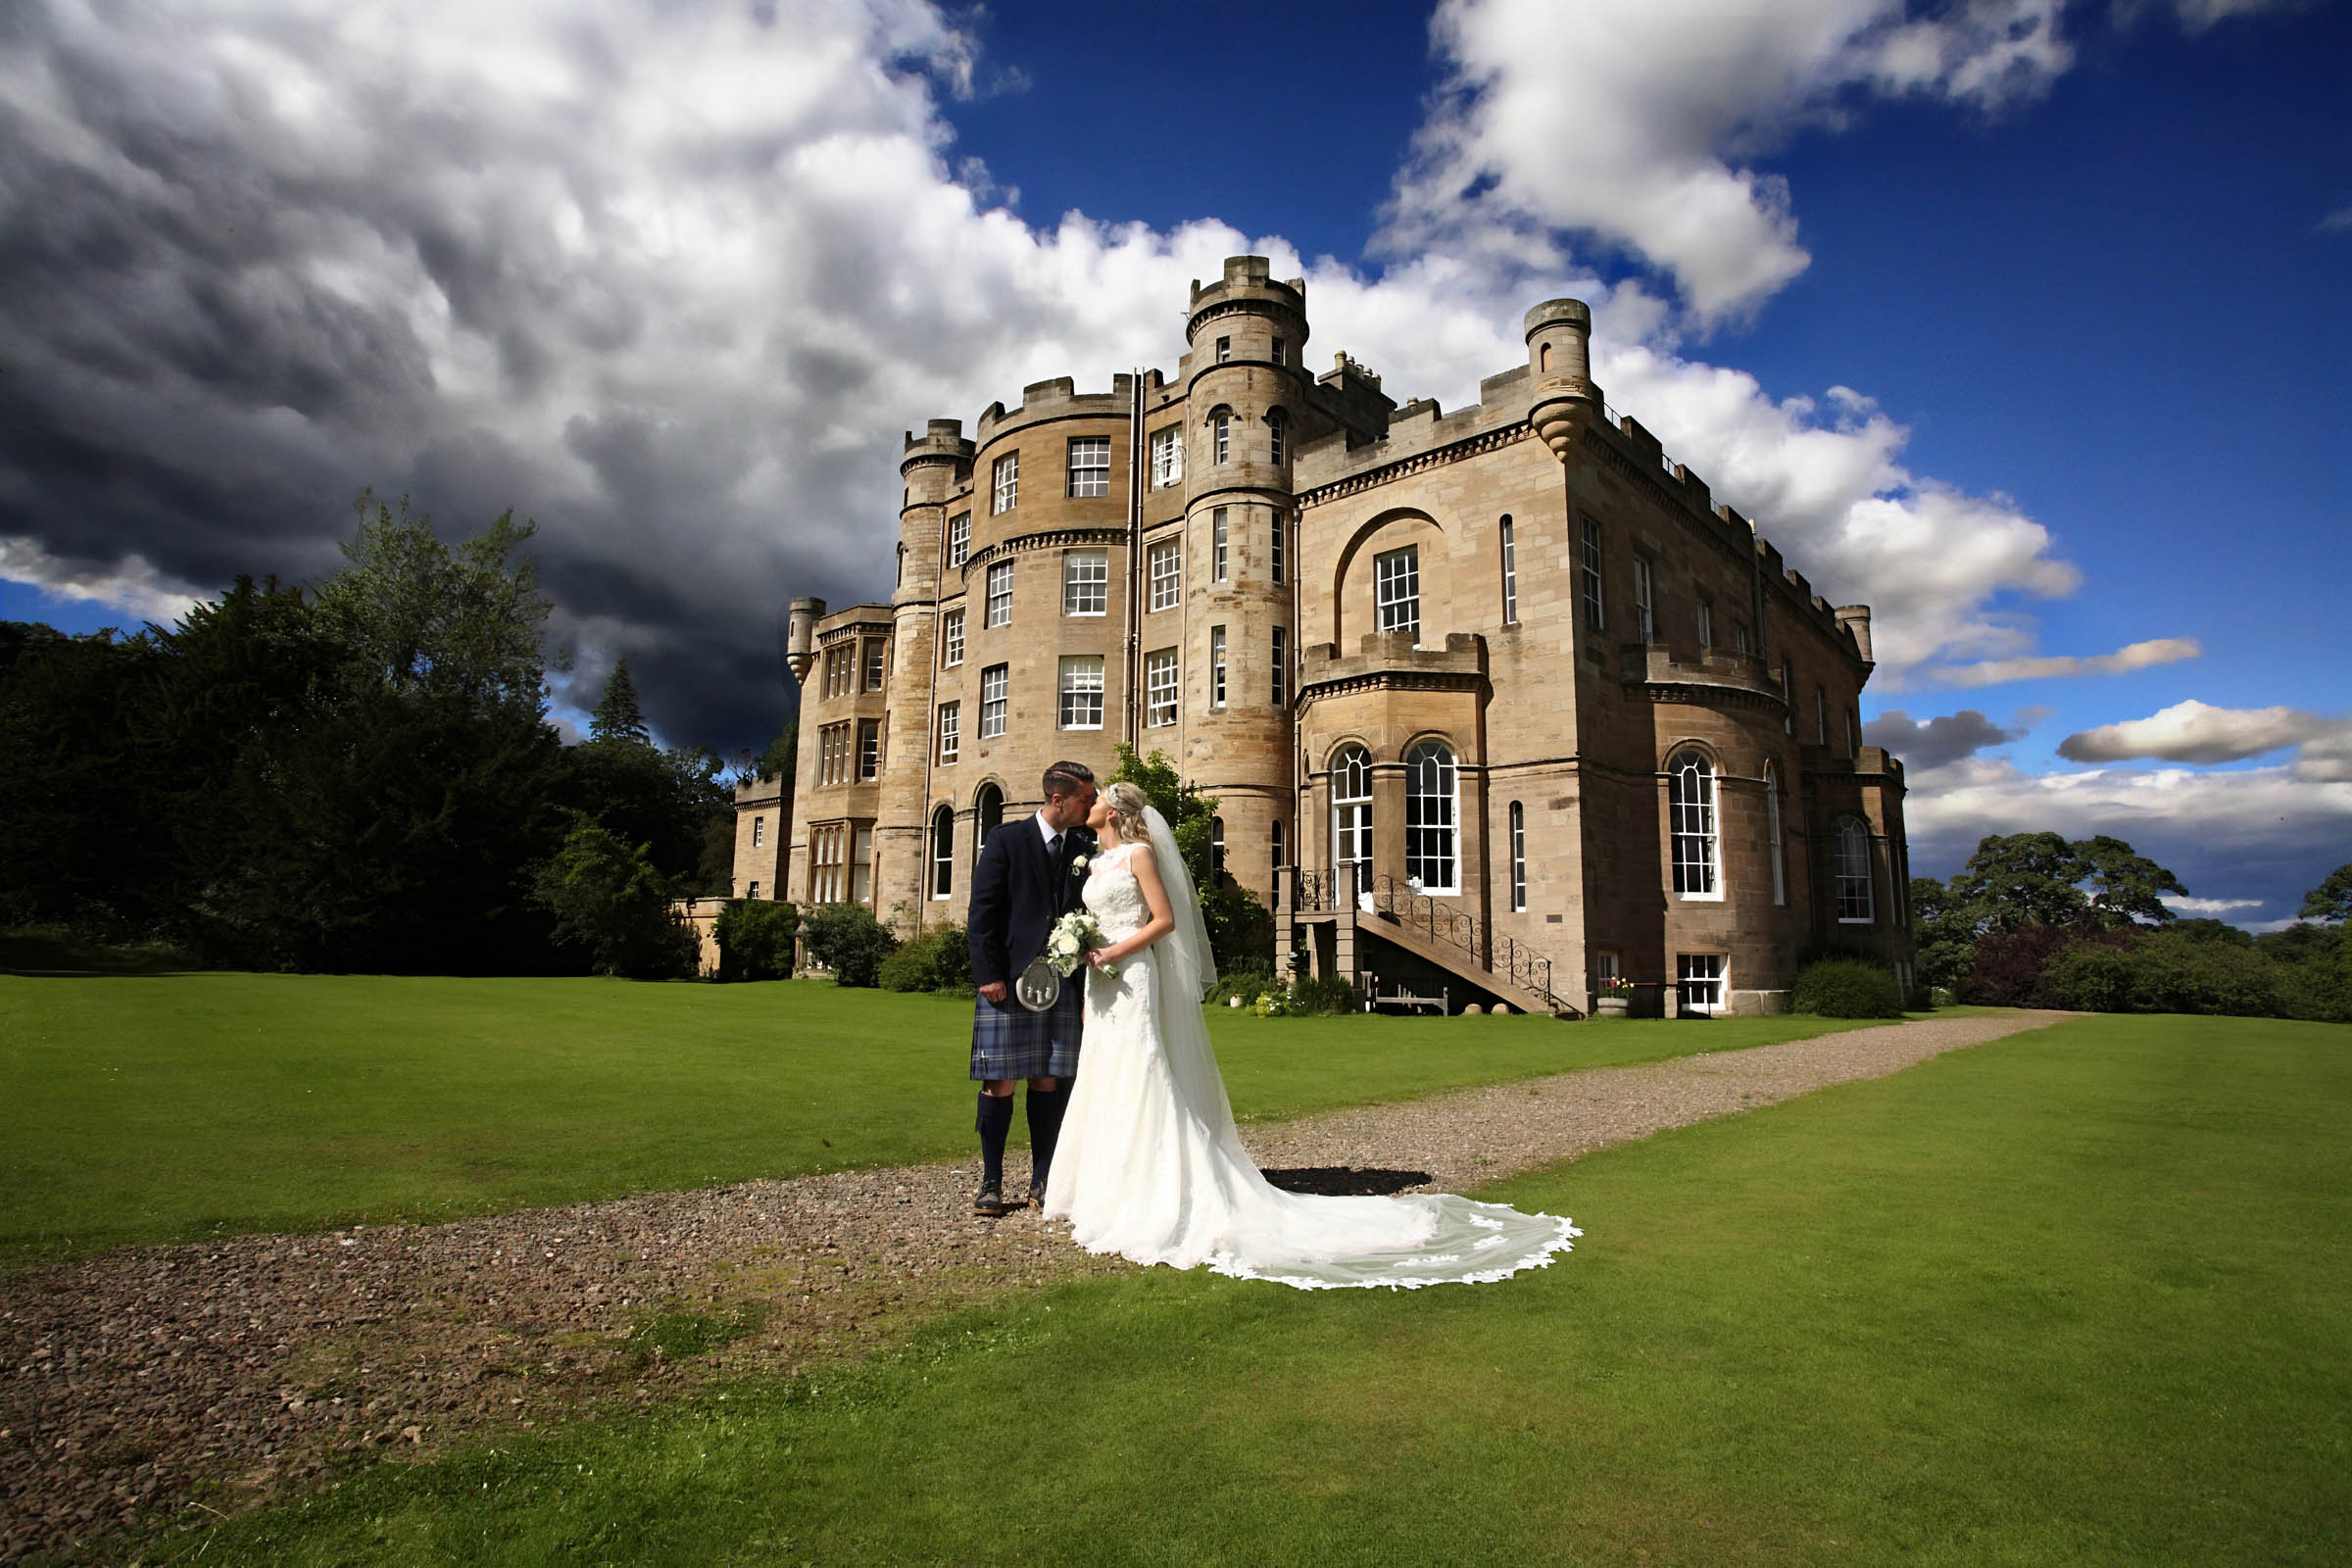 Classic_Scottish_Castle_wedding.jpg